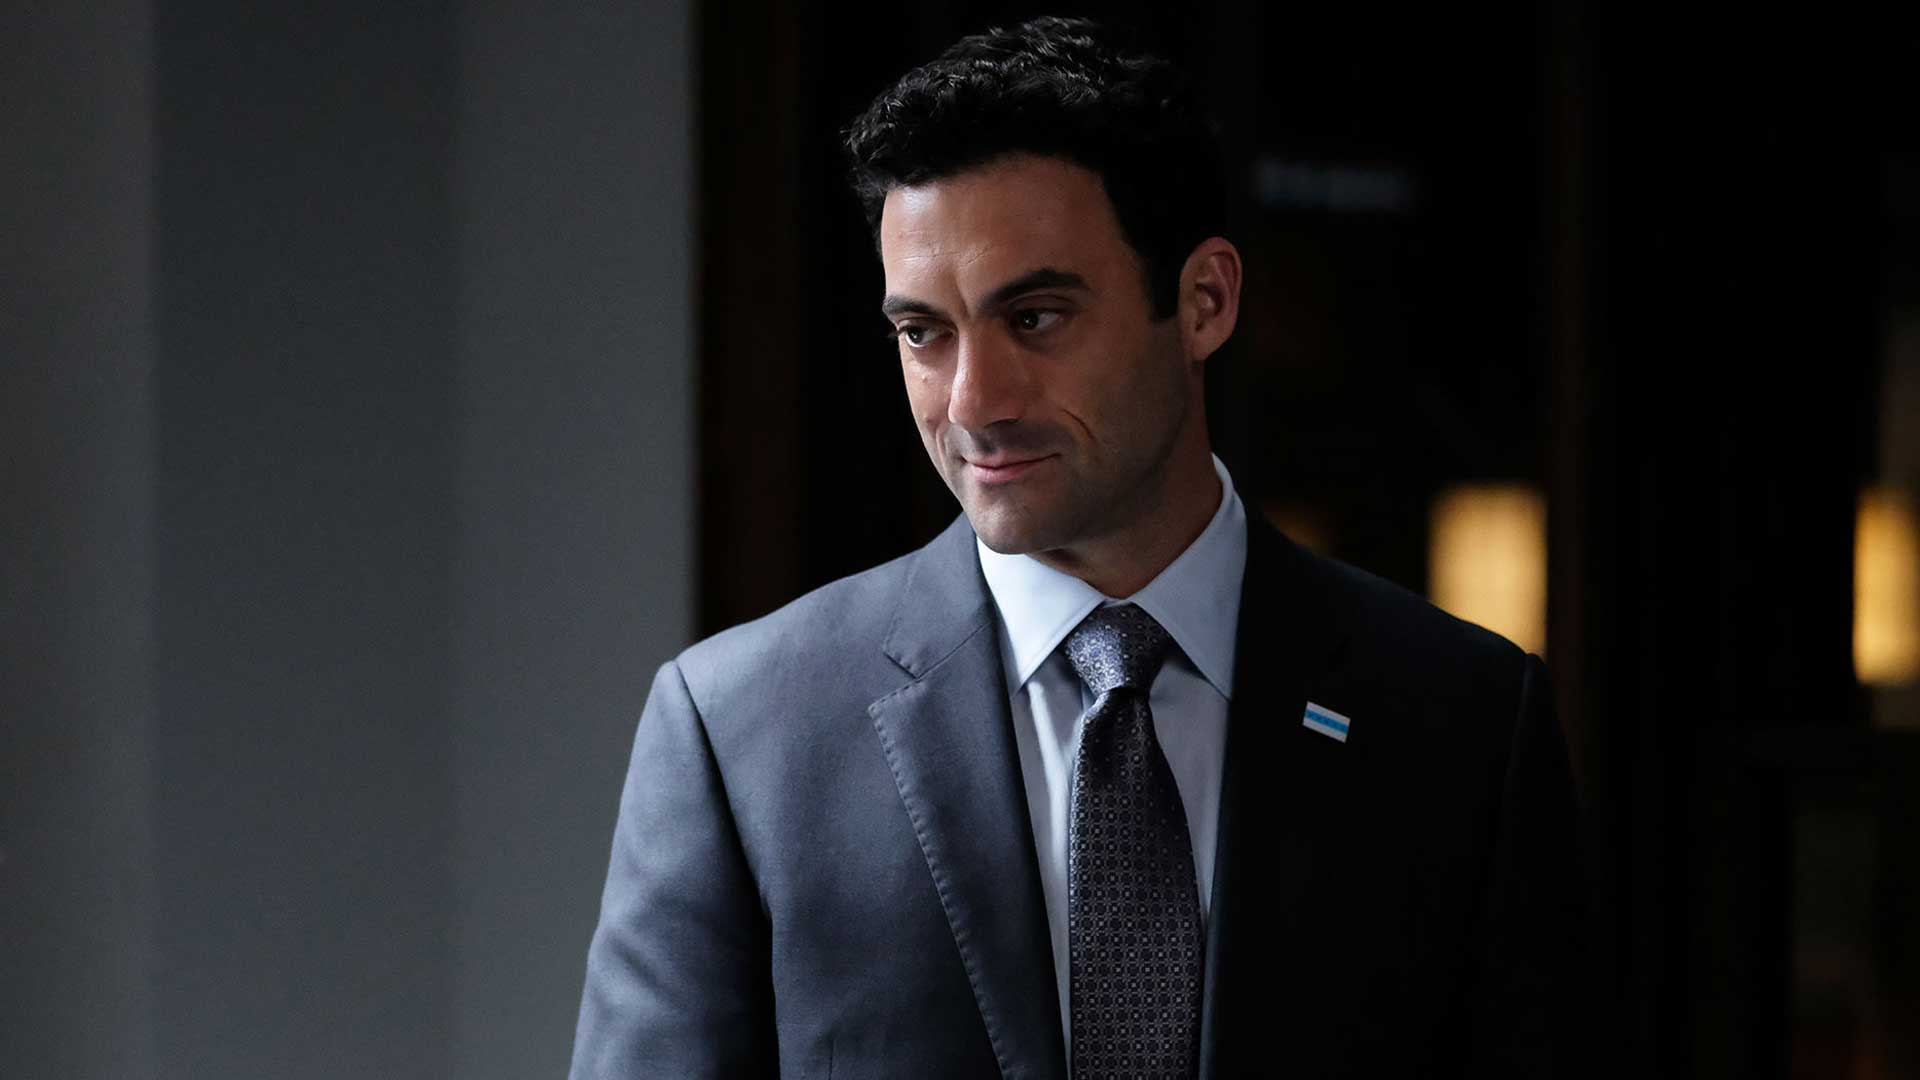 Pearson S01E01 Mayor Bobby Golec Morgan Spector